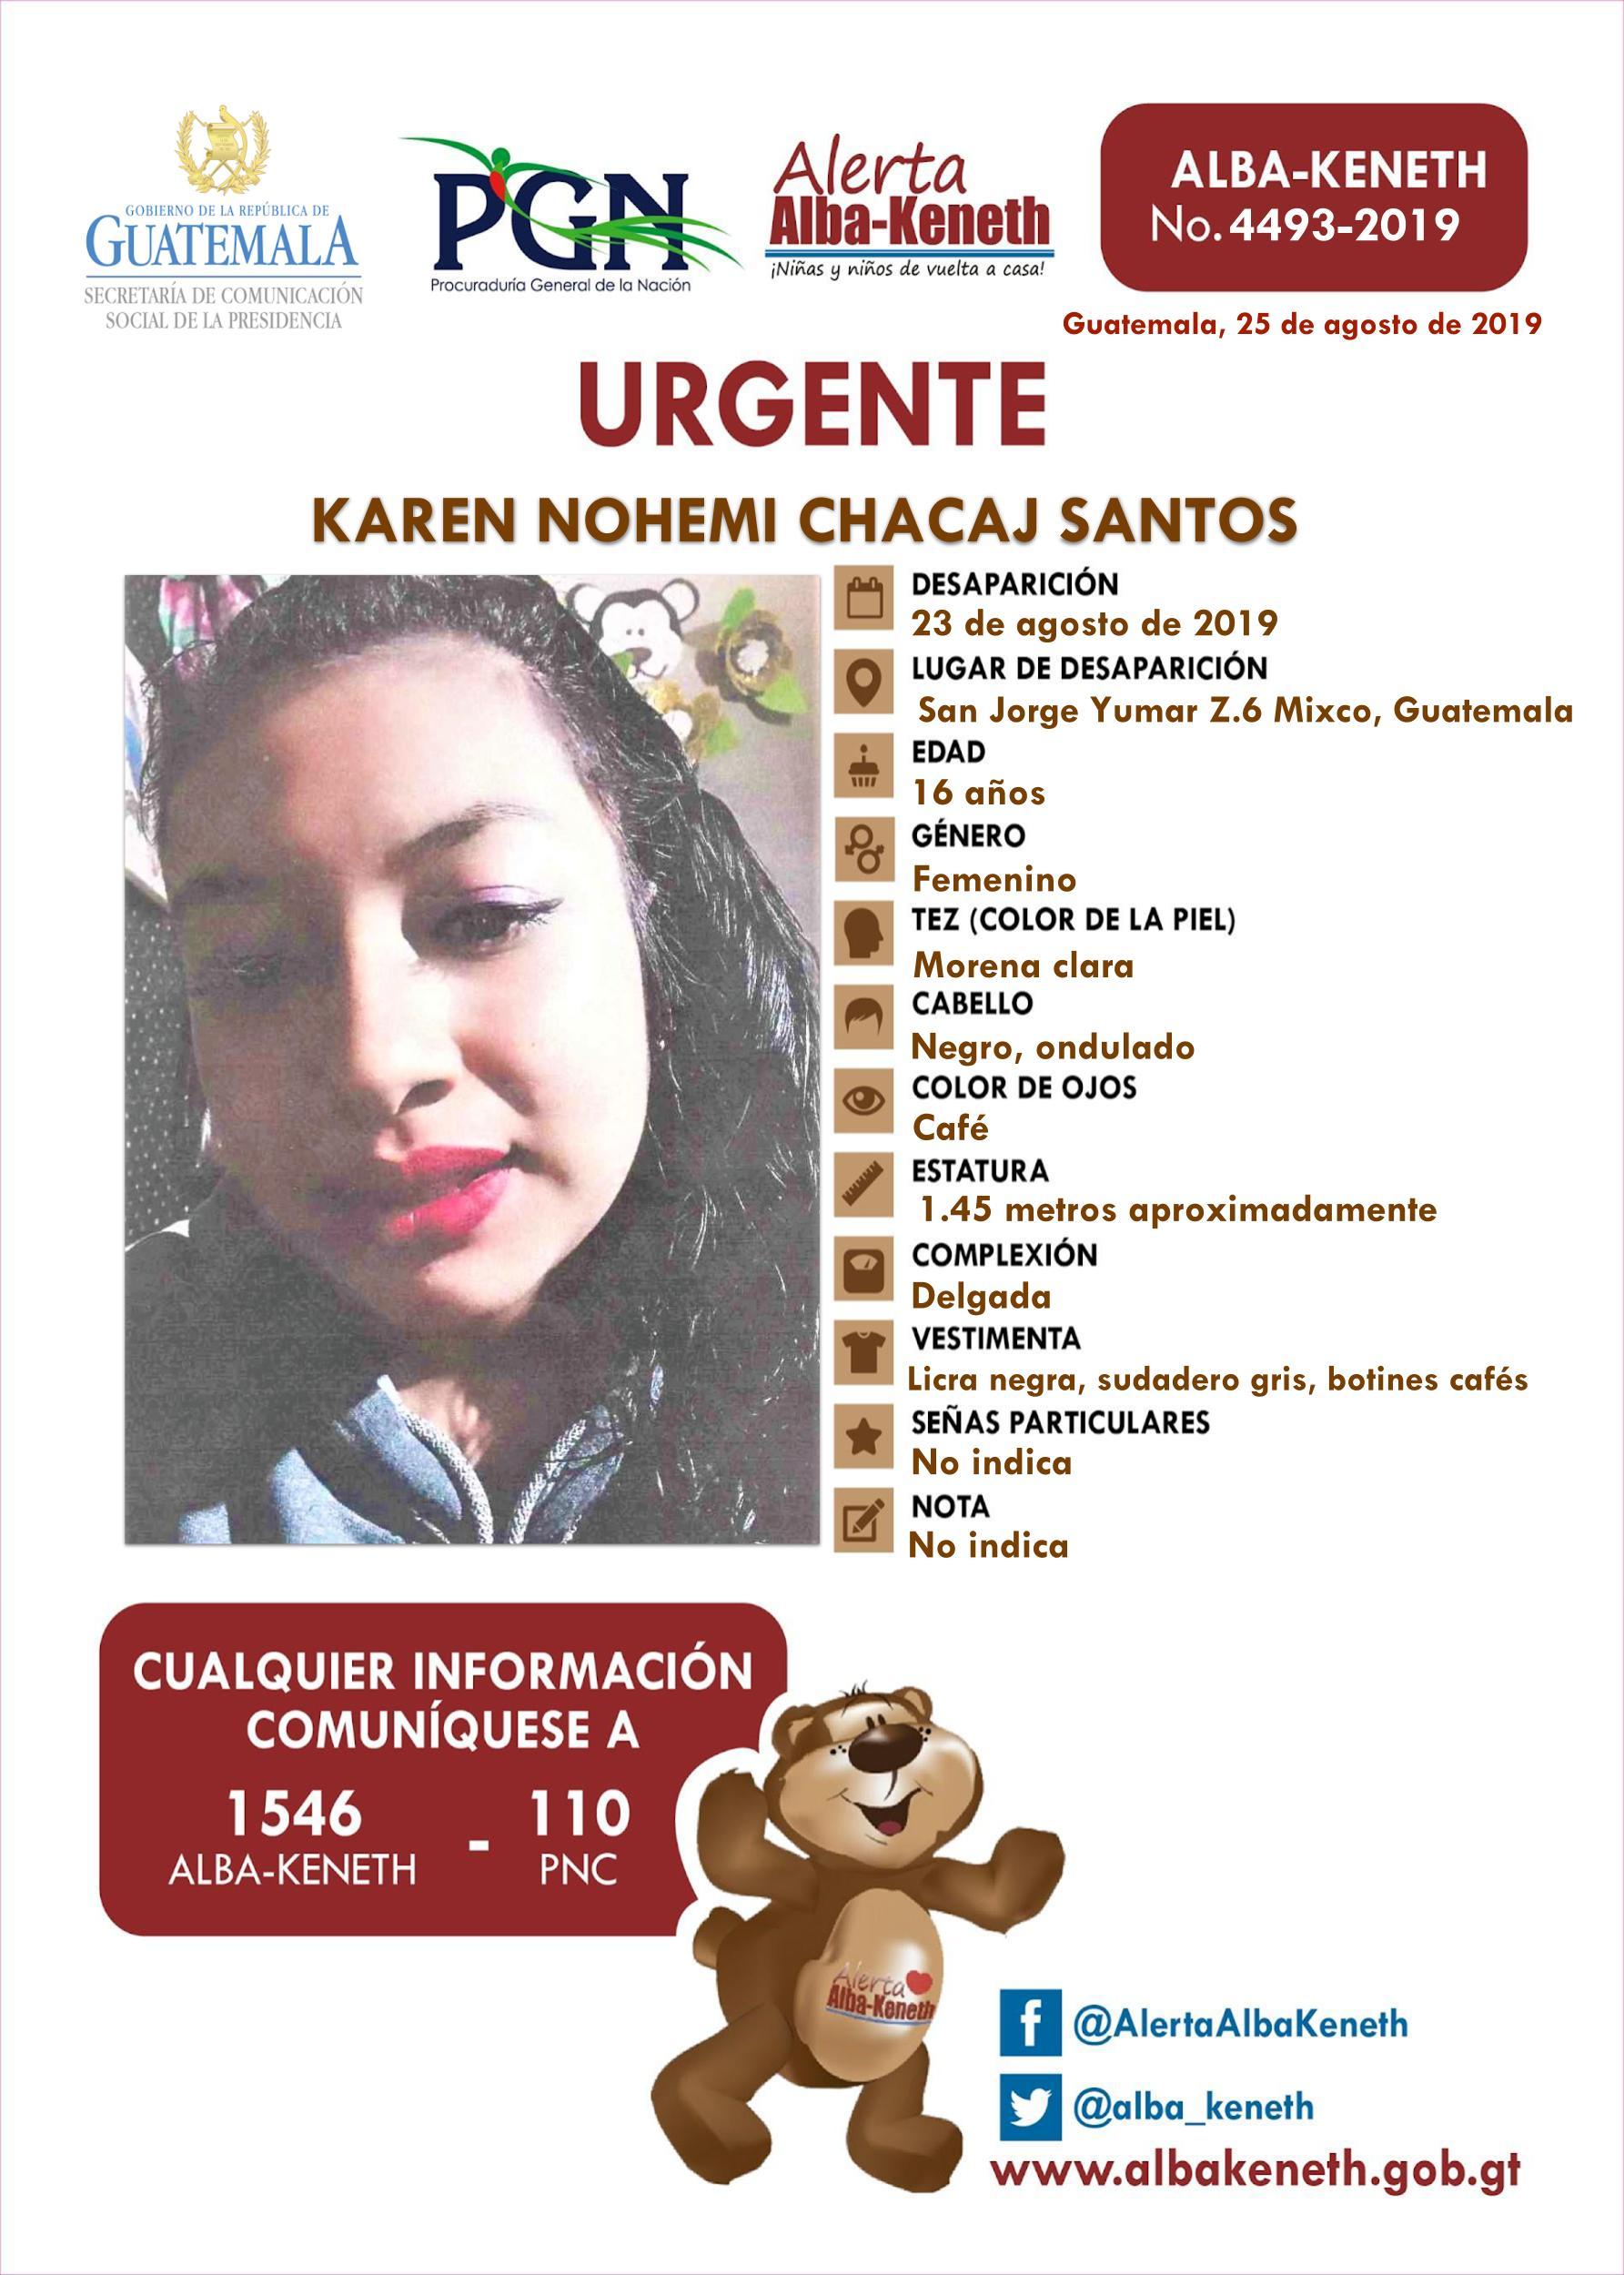 Karen Nohemi Chacaj Santos